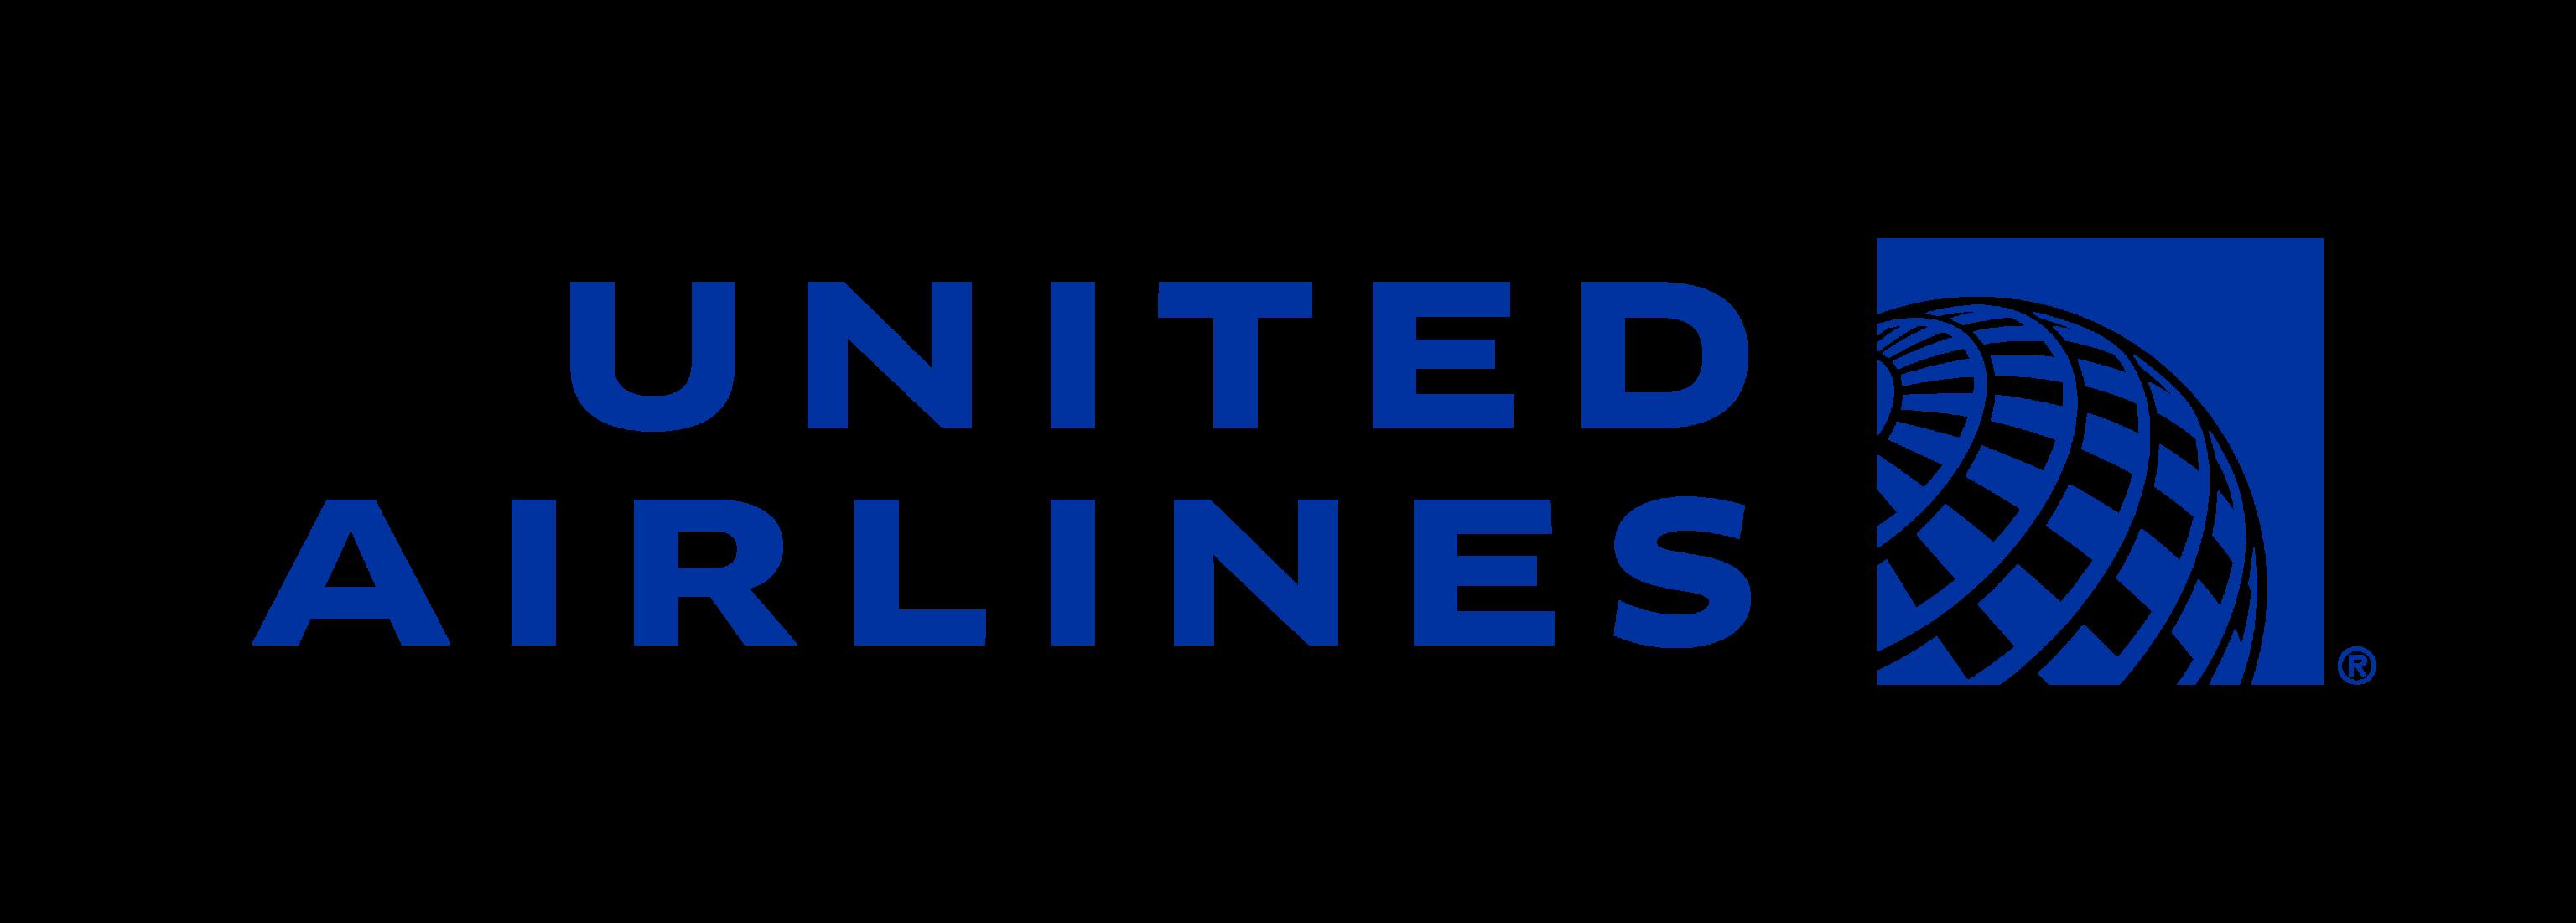 United Airlines Pilot Jobs